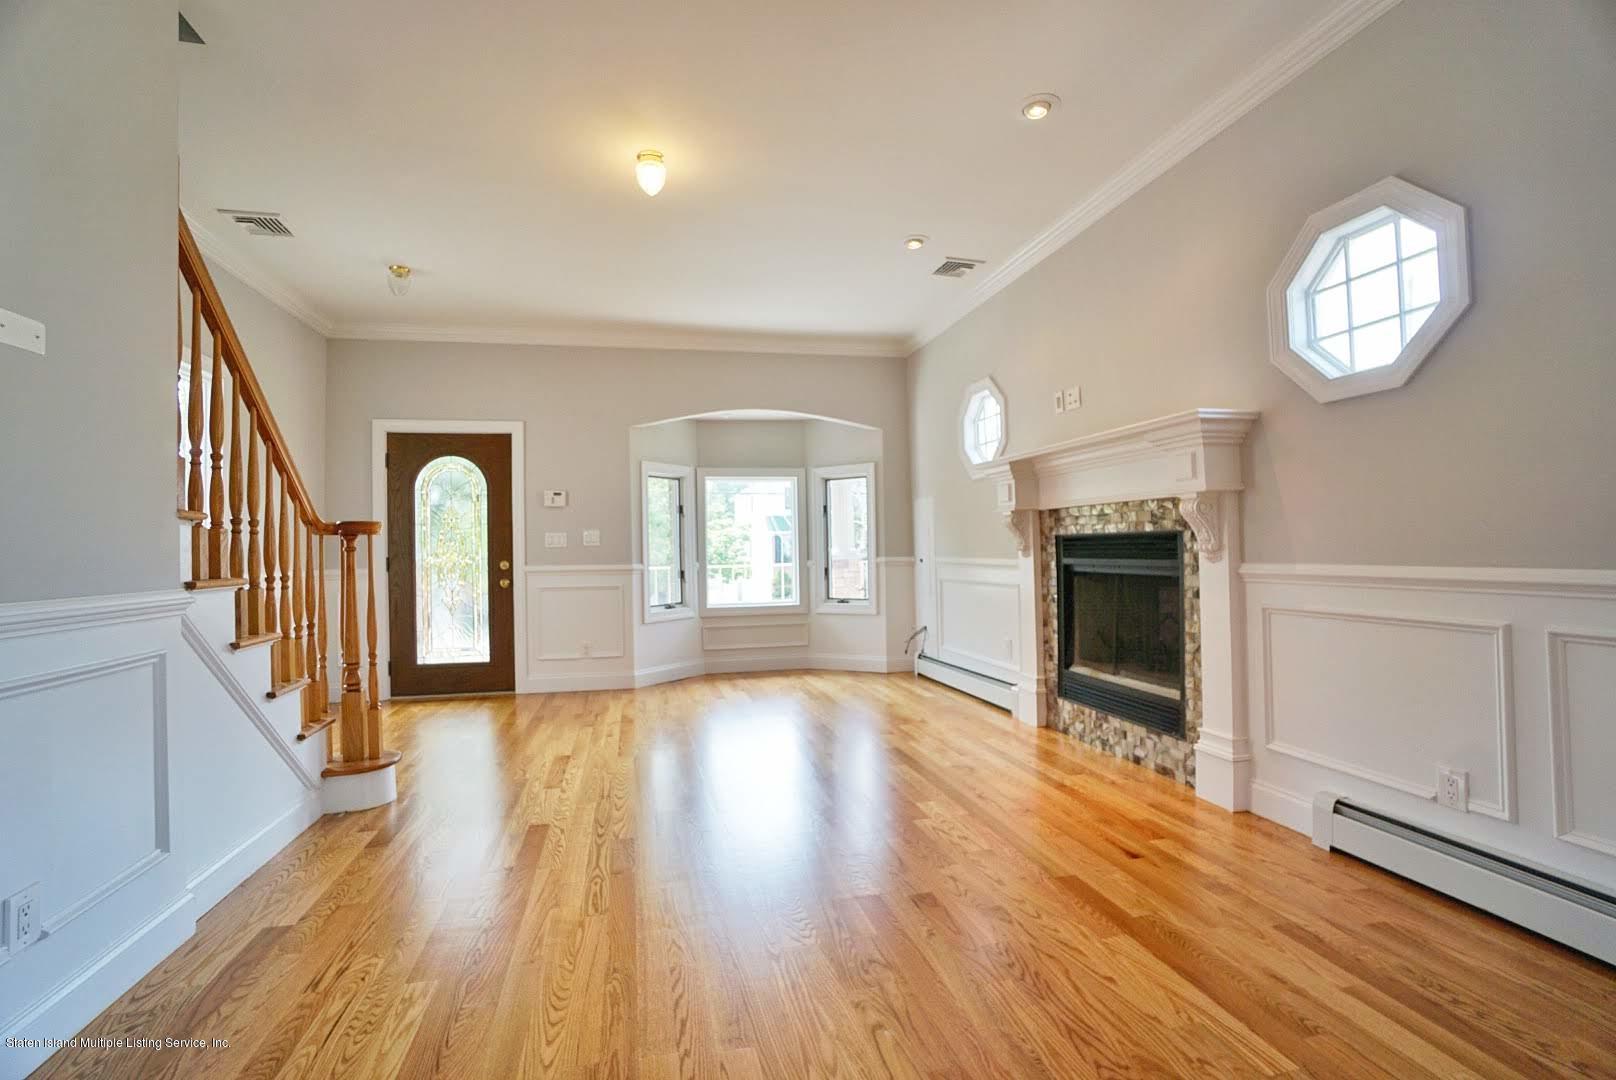 Single Family - Detached 445 Manhattan Street  Staten Island, NY 10307, MLS-1130505-7